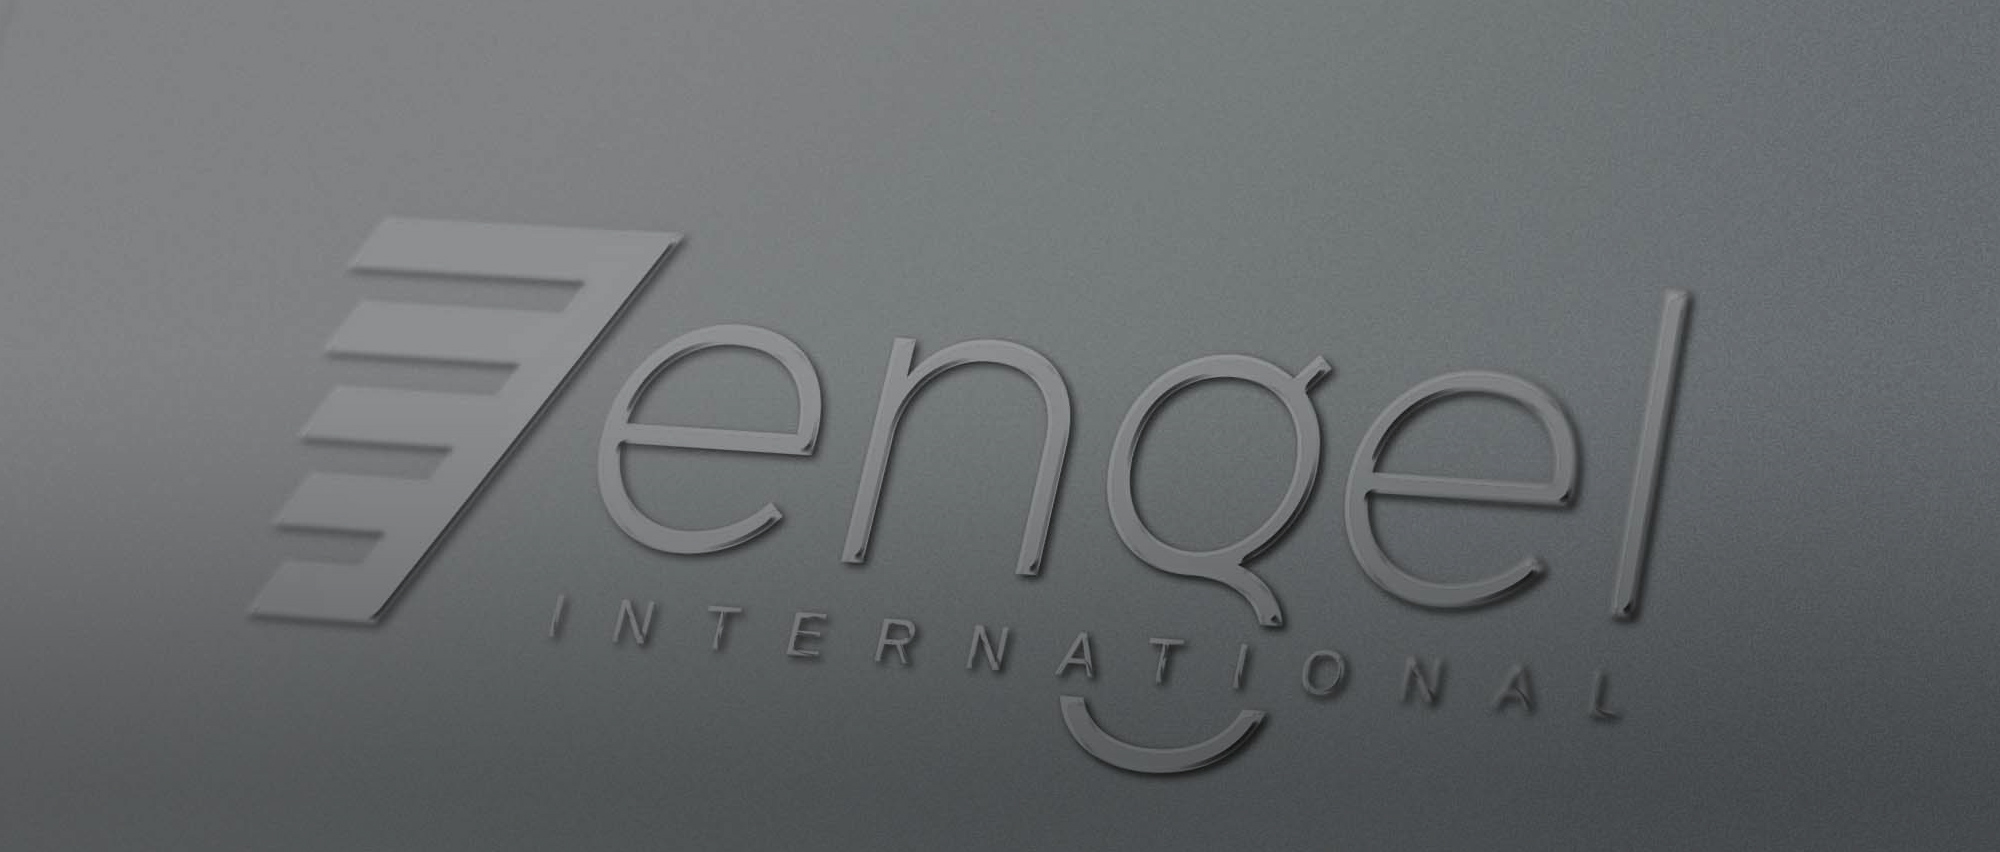 Engel International - Carsten Albert Engel